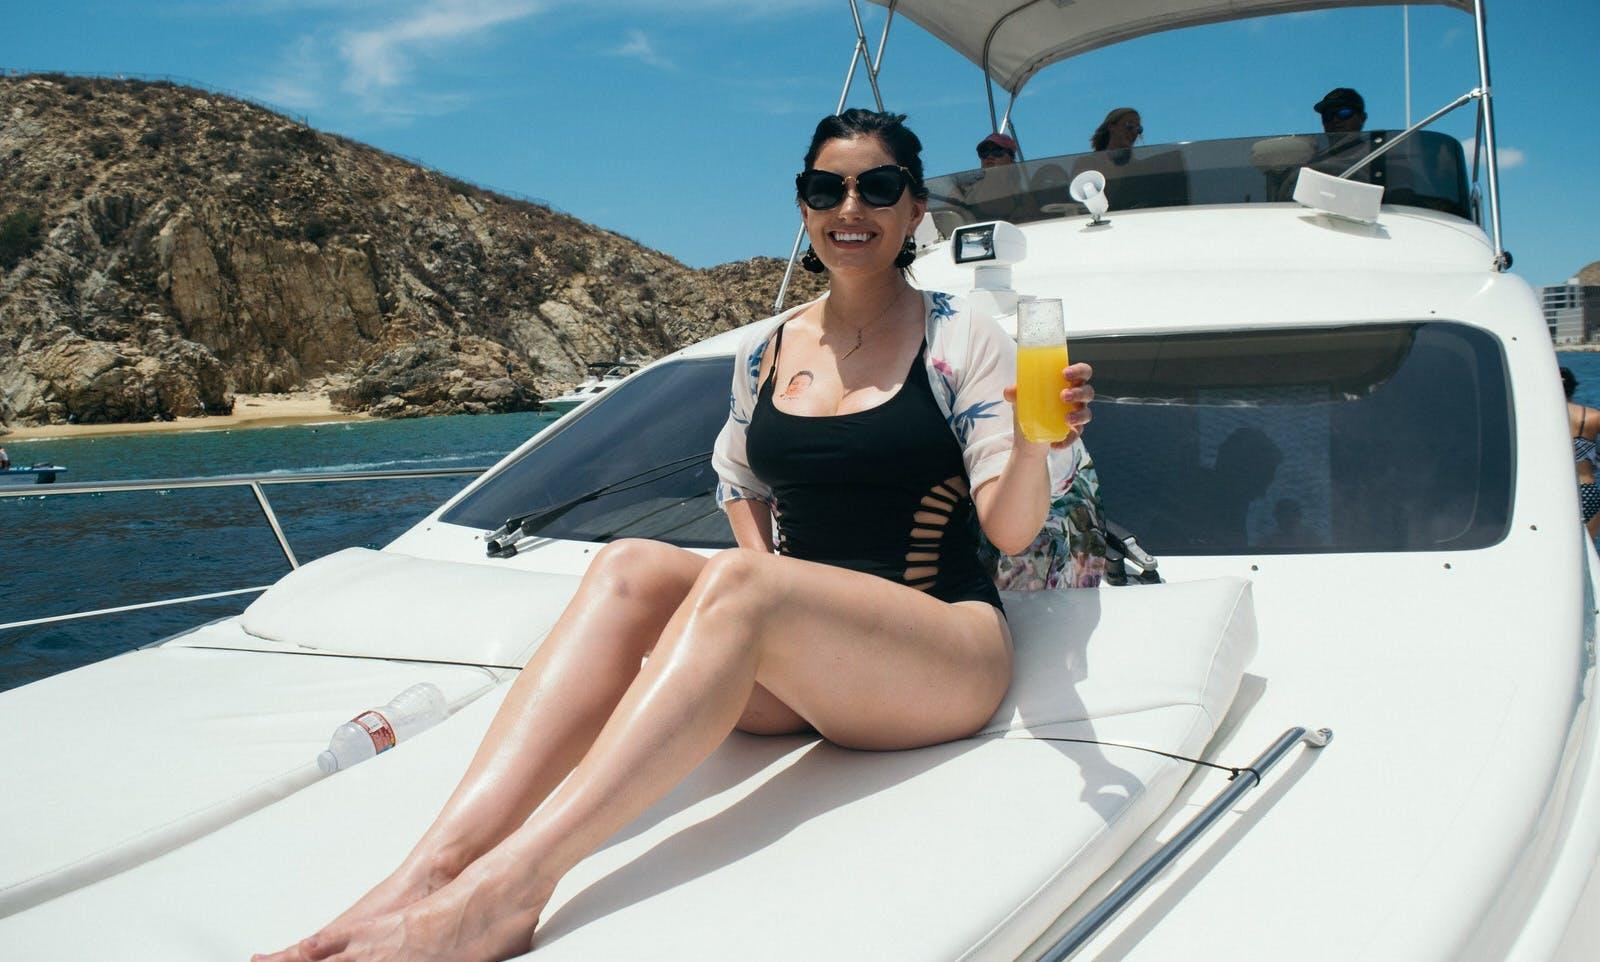 All-Inclusive Italian Yacht in Cabo San Lucas